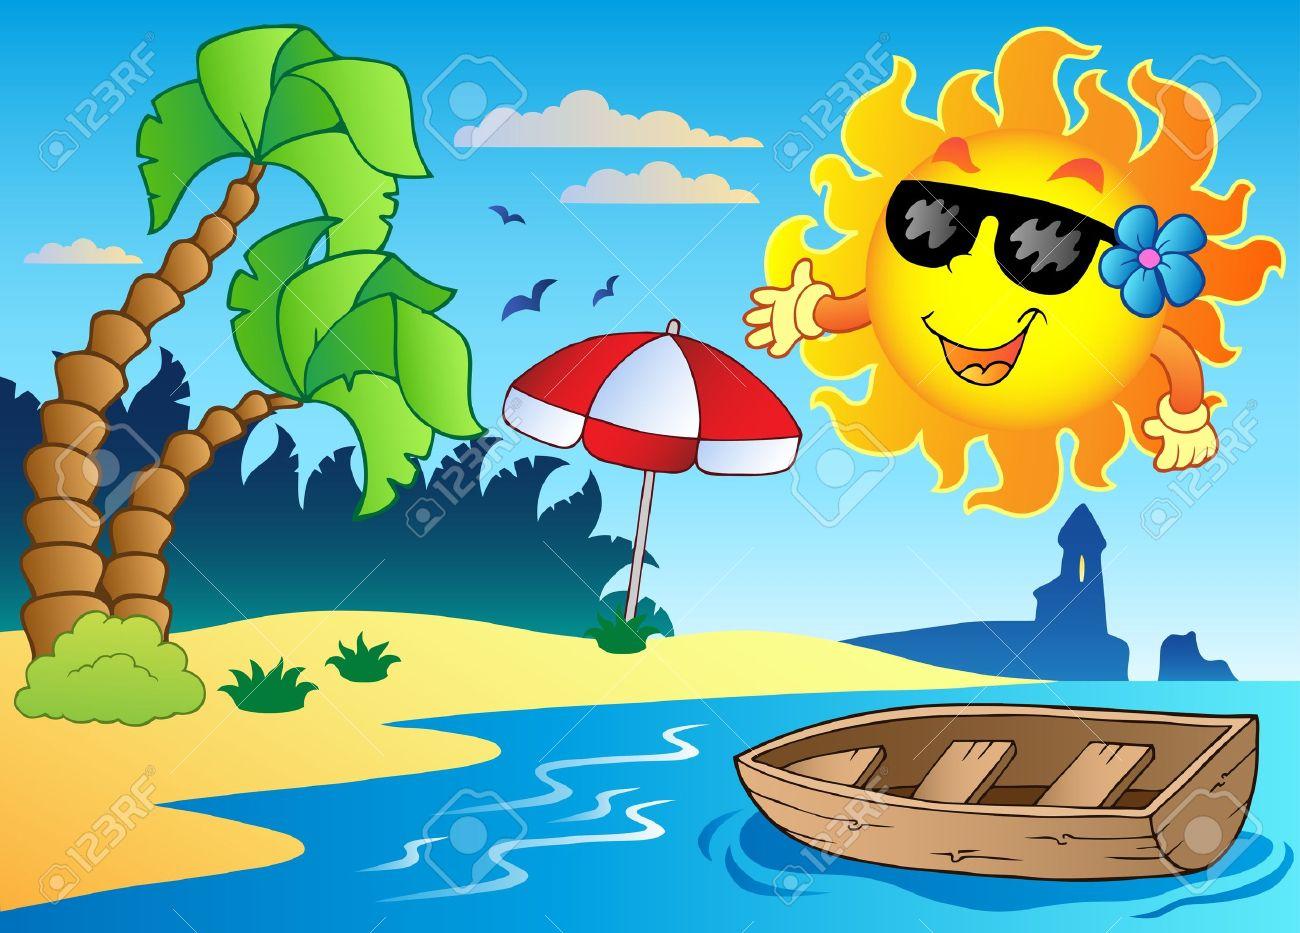 Summer season clipart clip free stock Summer season clipart 5 » Clipart Station clip free stock